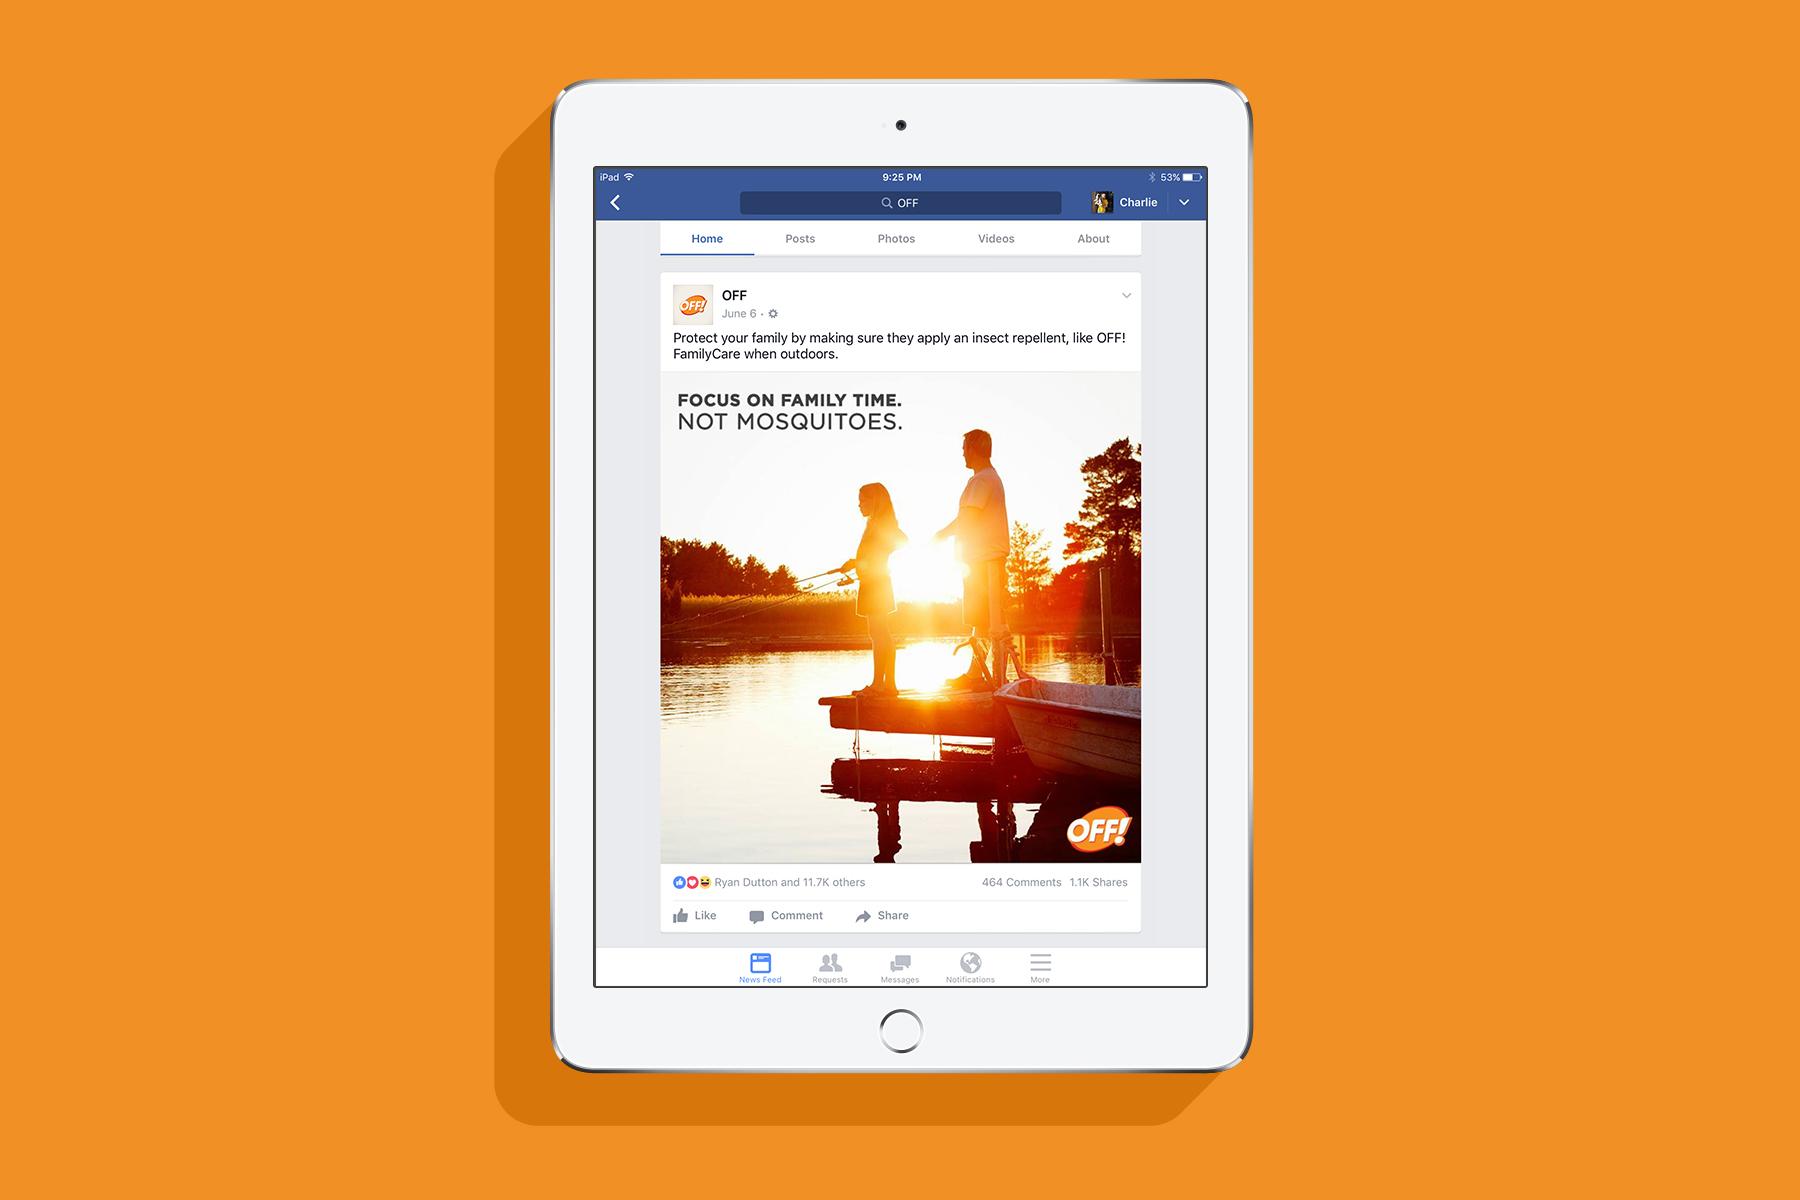 Off_PeaceOfMind_FB_Post_iPad_MOCK_A.jpg